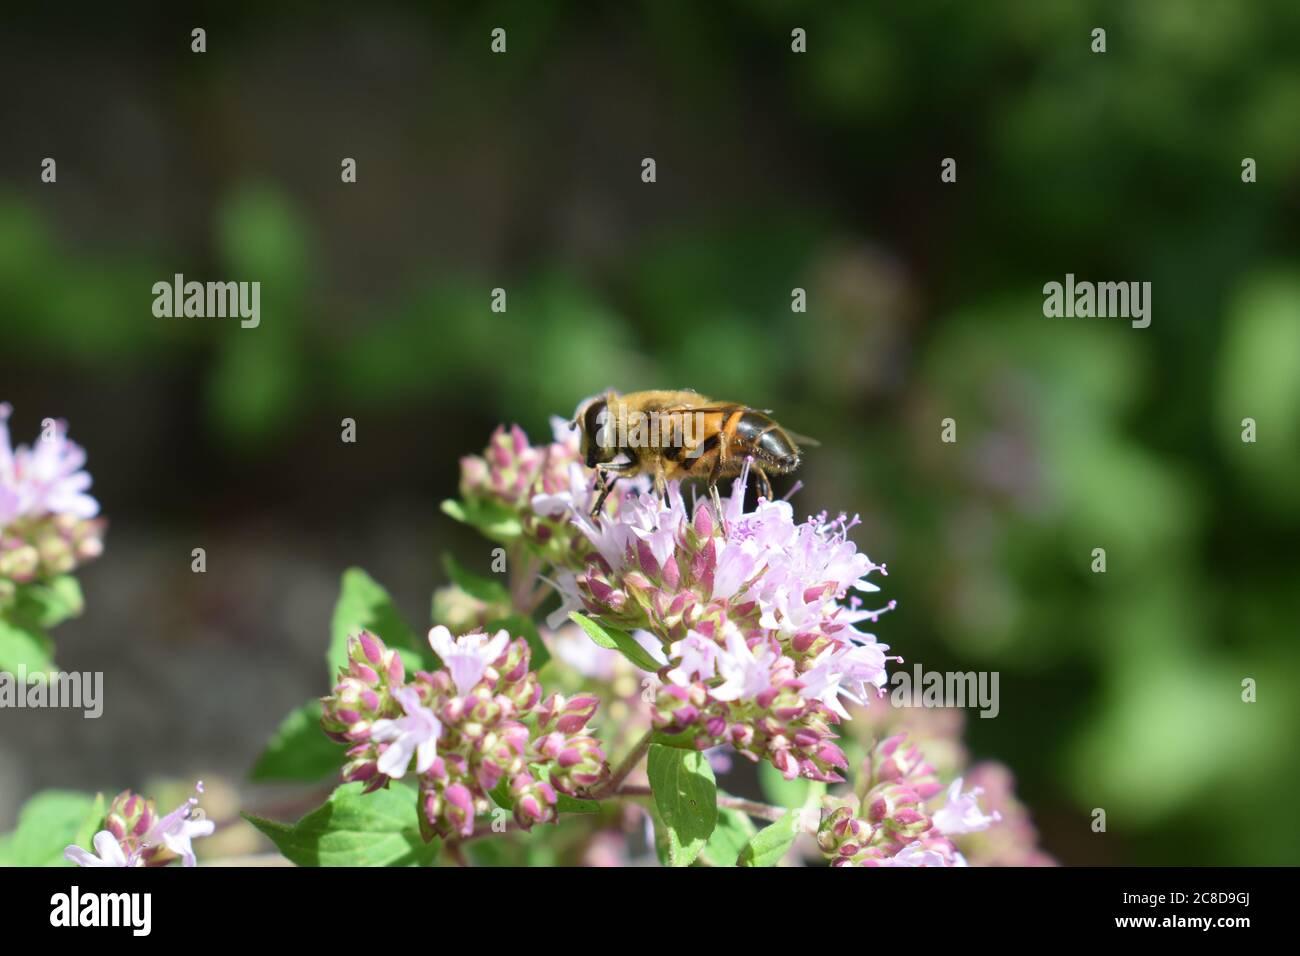 abejas en flores de orégano Foto de stock